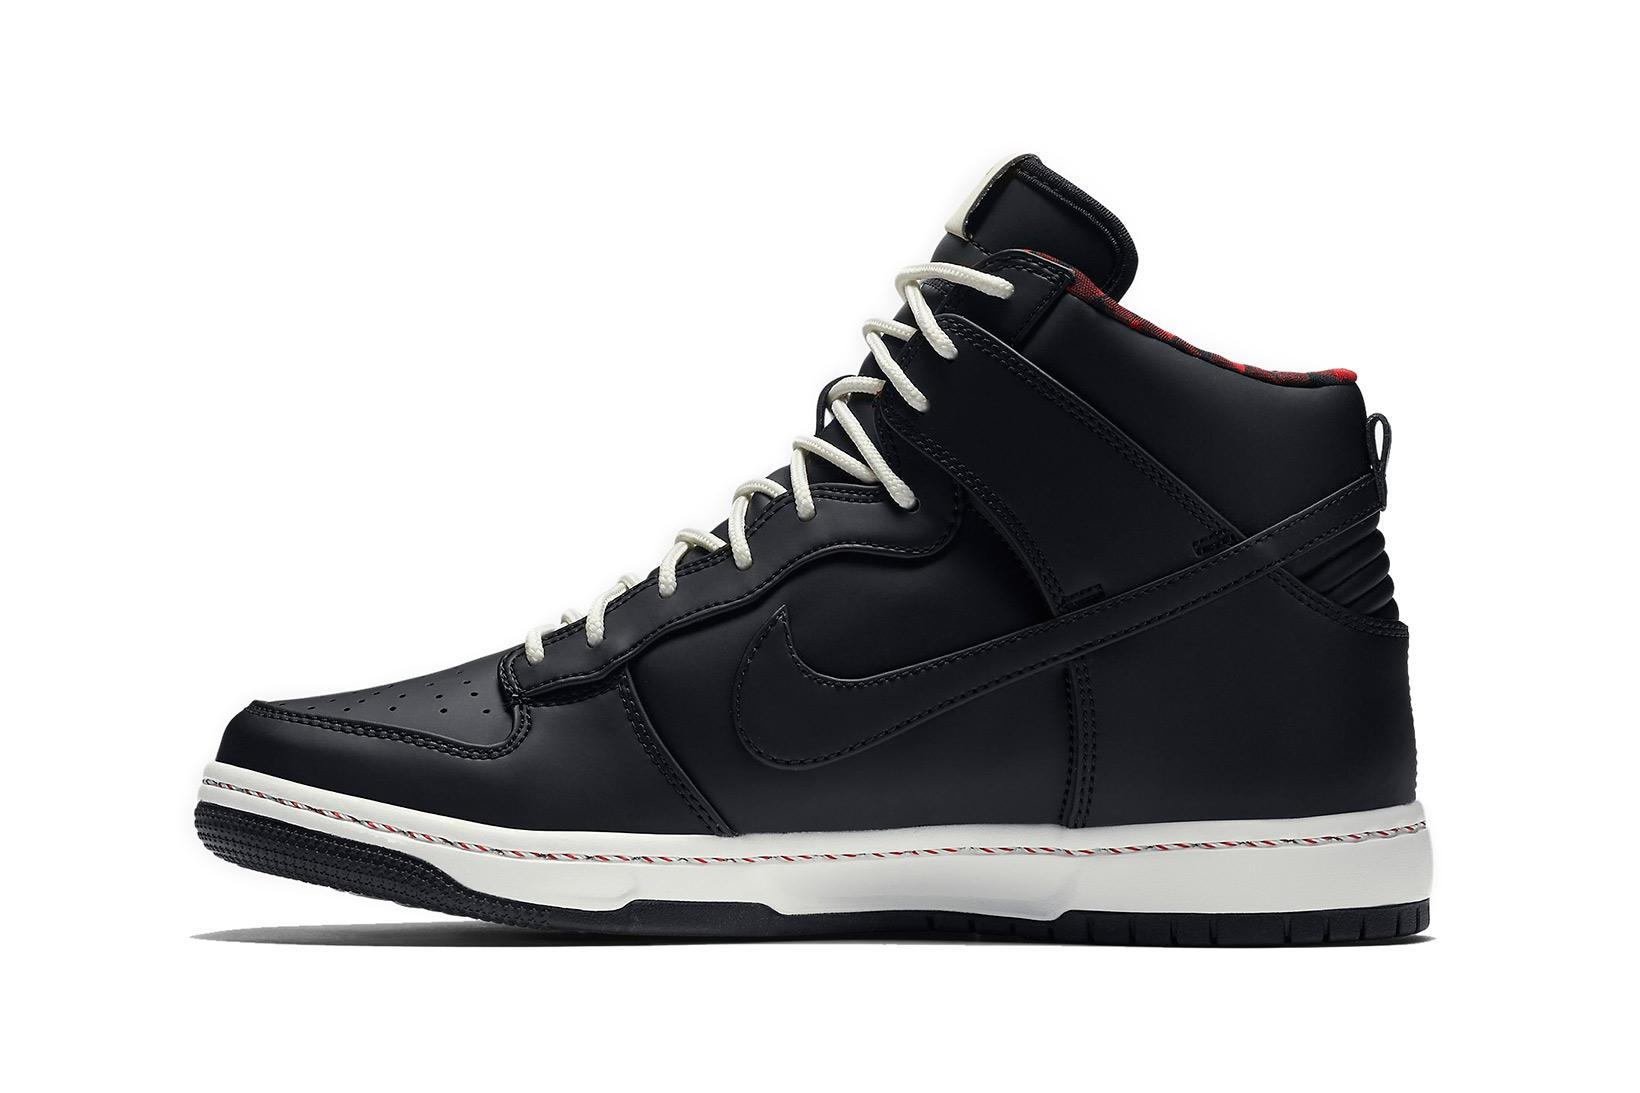 Nike Dunk High CMFT - Black - University Red - SneakerNews.com